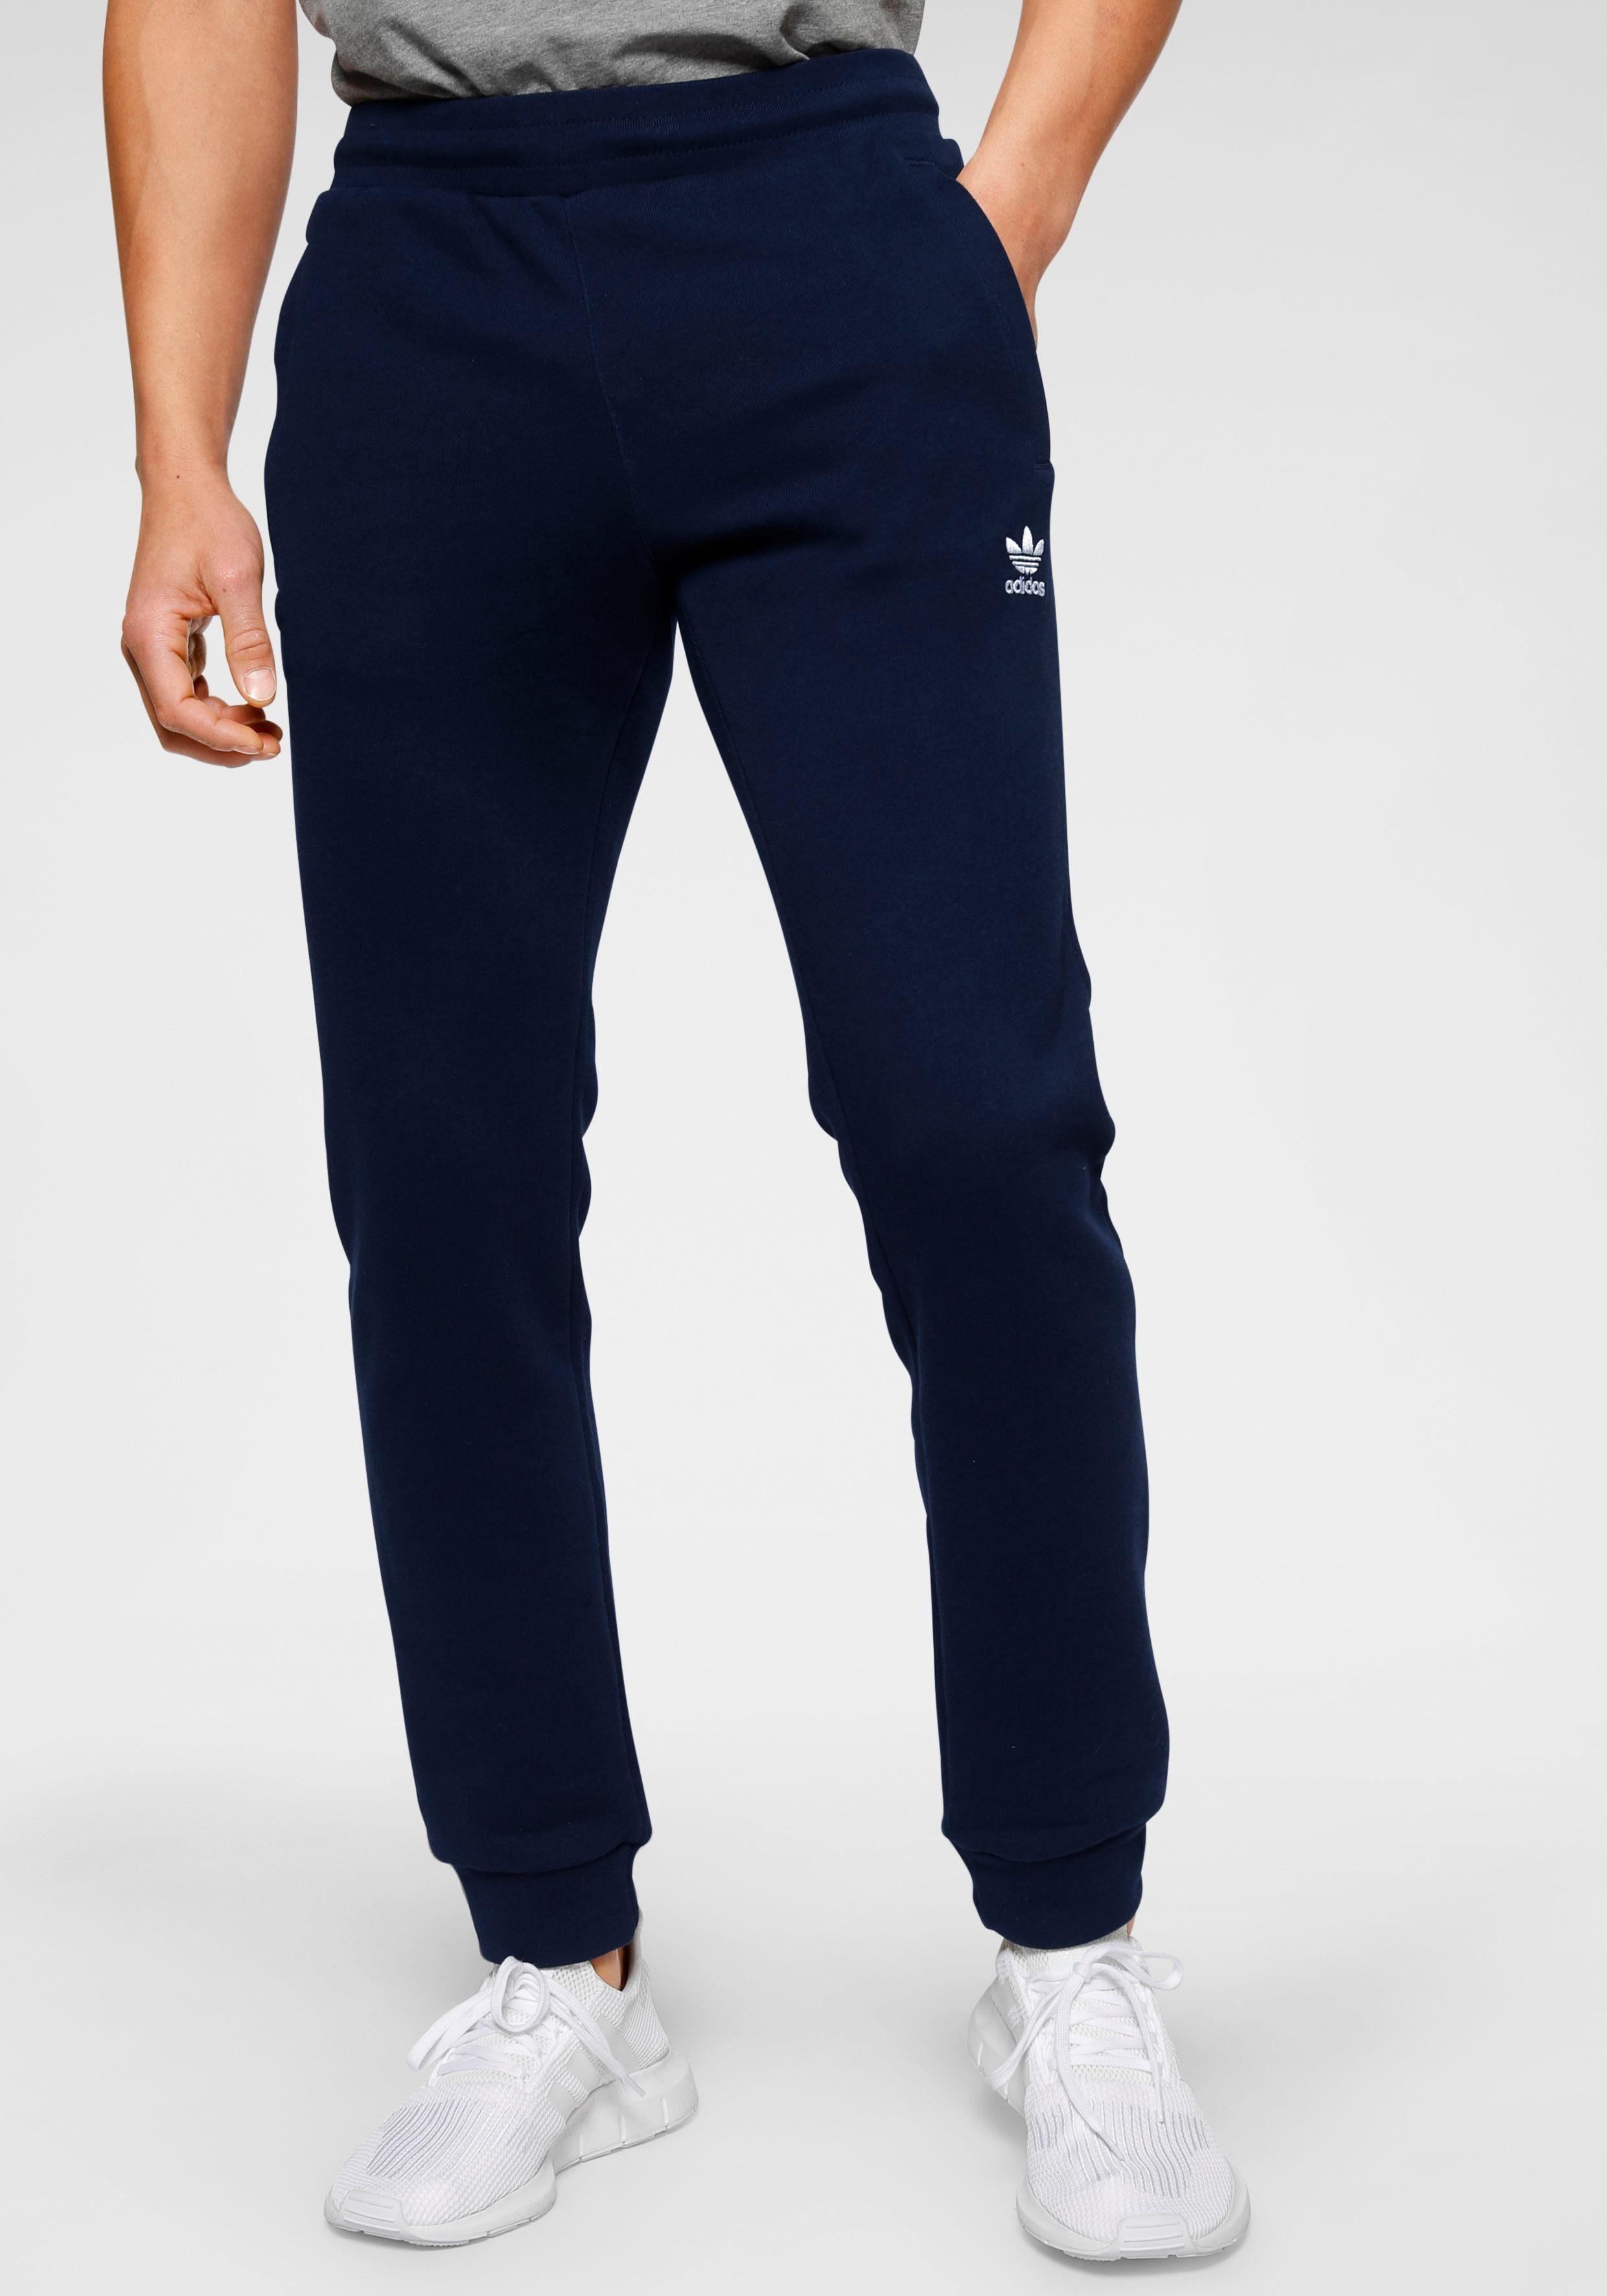 adidas Originals Jogginghose »TREFOIL PANT«, Jogginghose von adidas Originals online kaufen | OTTO